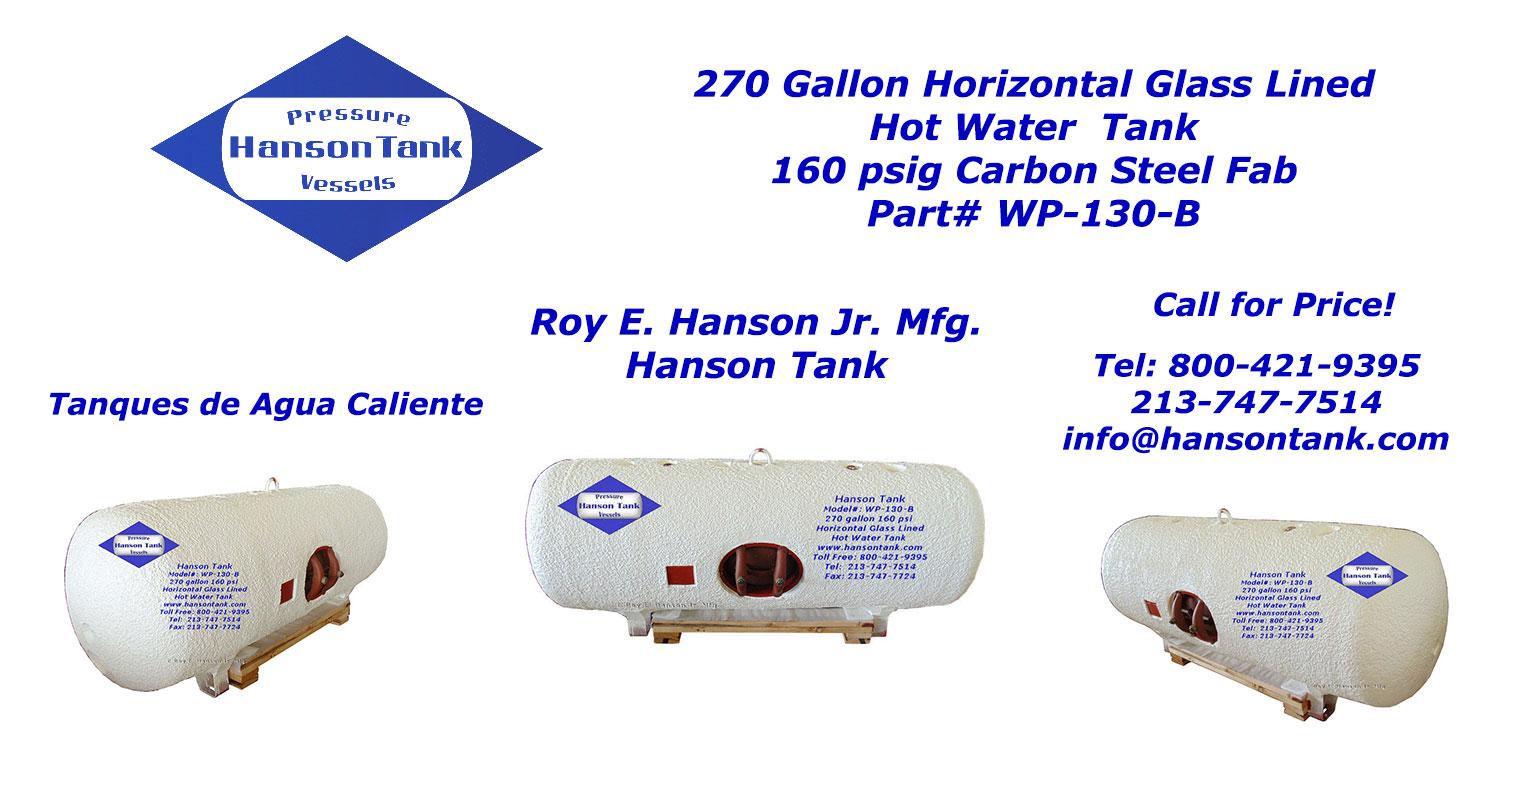 WP-130-B 270 gallon hot water tank